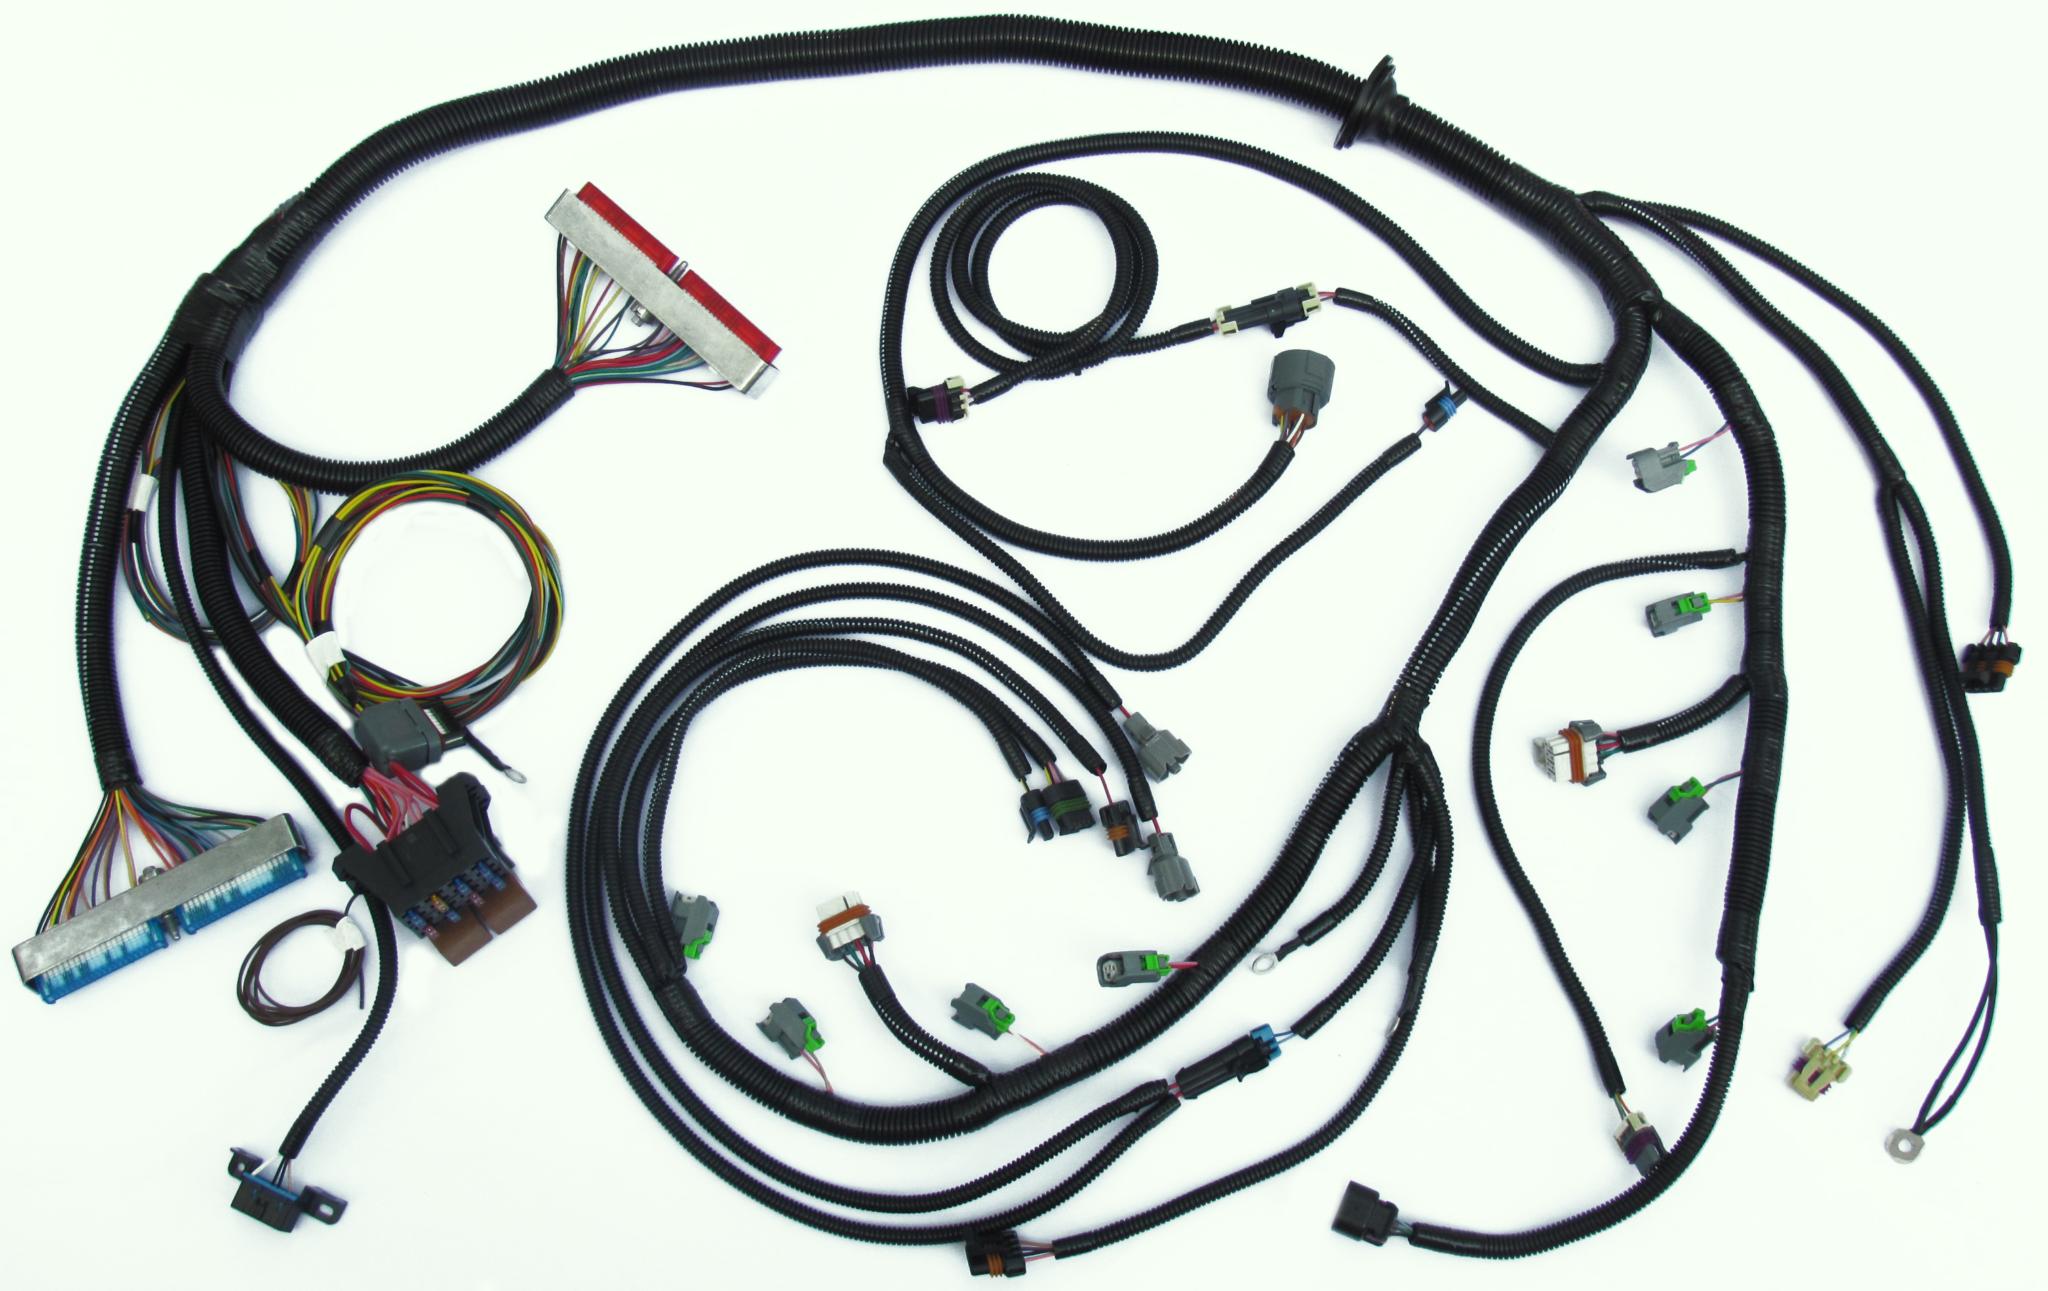 06 \u002707 24x gen iv ls2 w 4l60e standalone wiring harness (dbw hPa Wiring Harness 9e1ed93a327b430137bfb12ce7051400 054b2084d401df0137bfacea76051400 2fe67454359ff50137bfac9669051400 8badab894940000137bfad8c55051400 \u0027